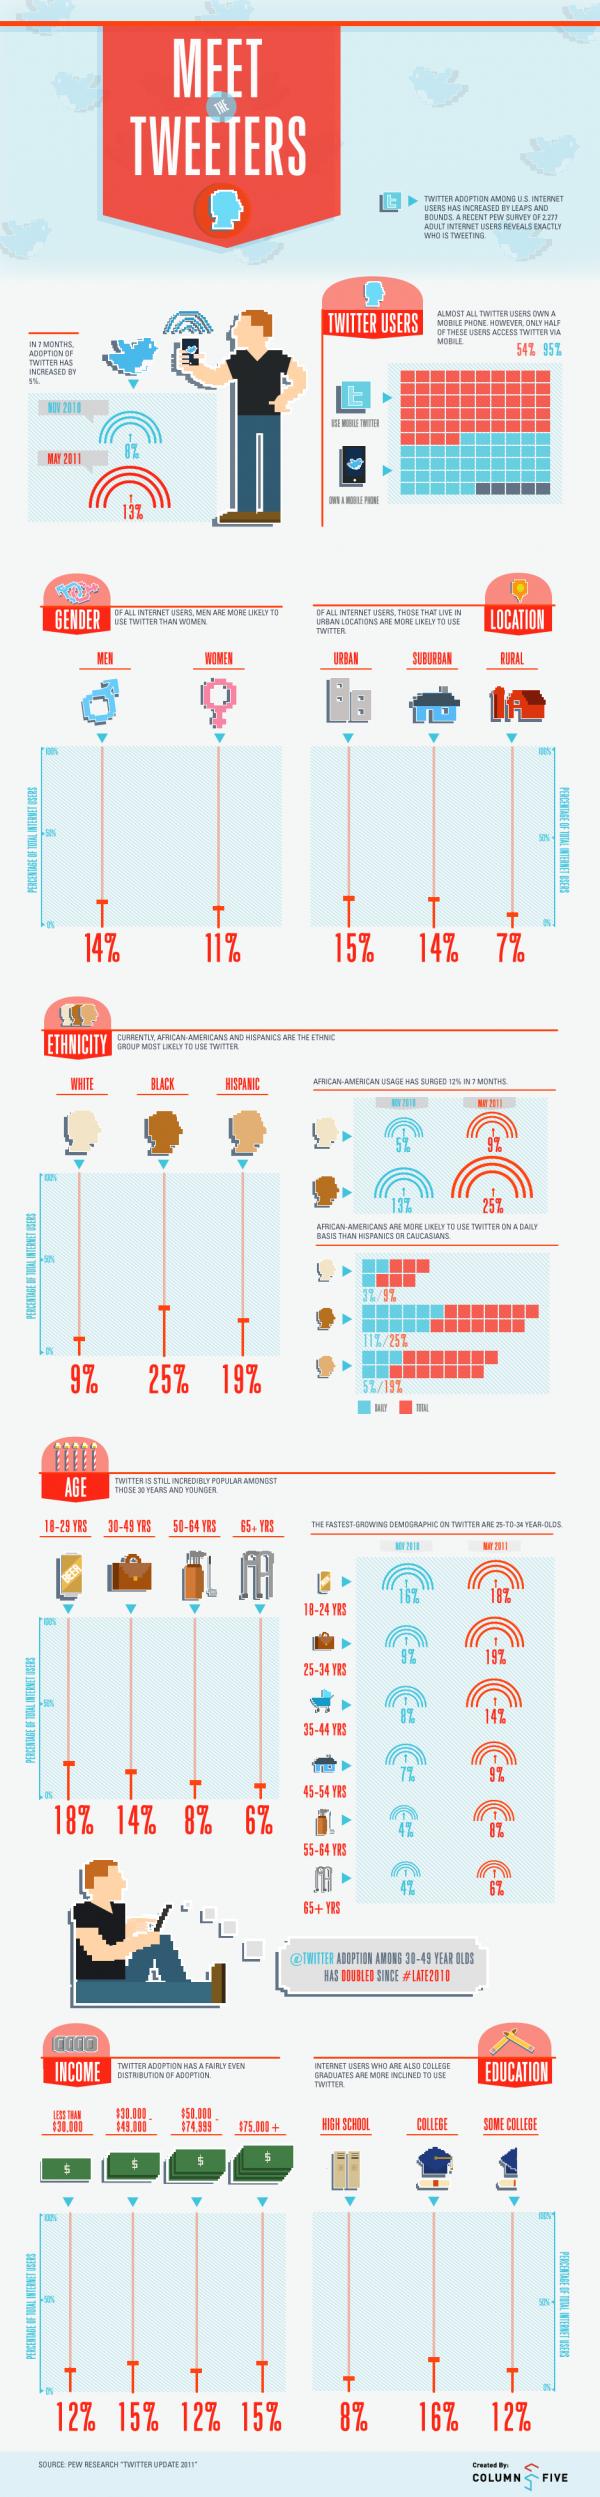 infographic-on-social-media-20